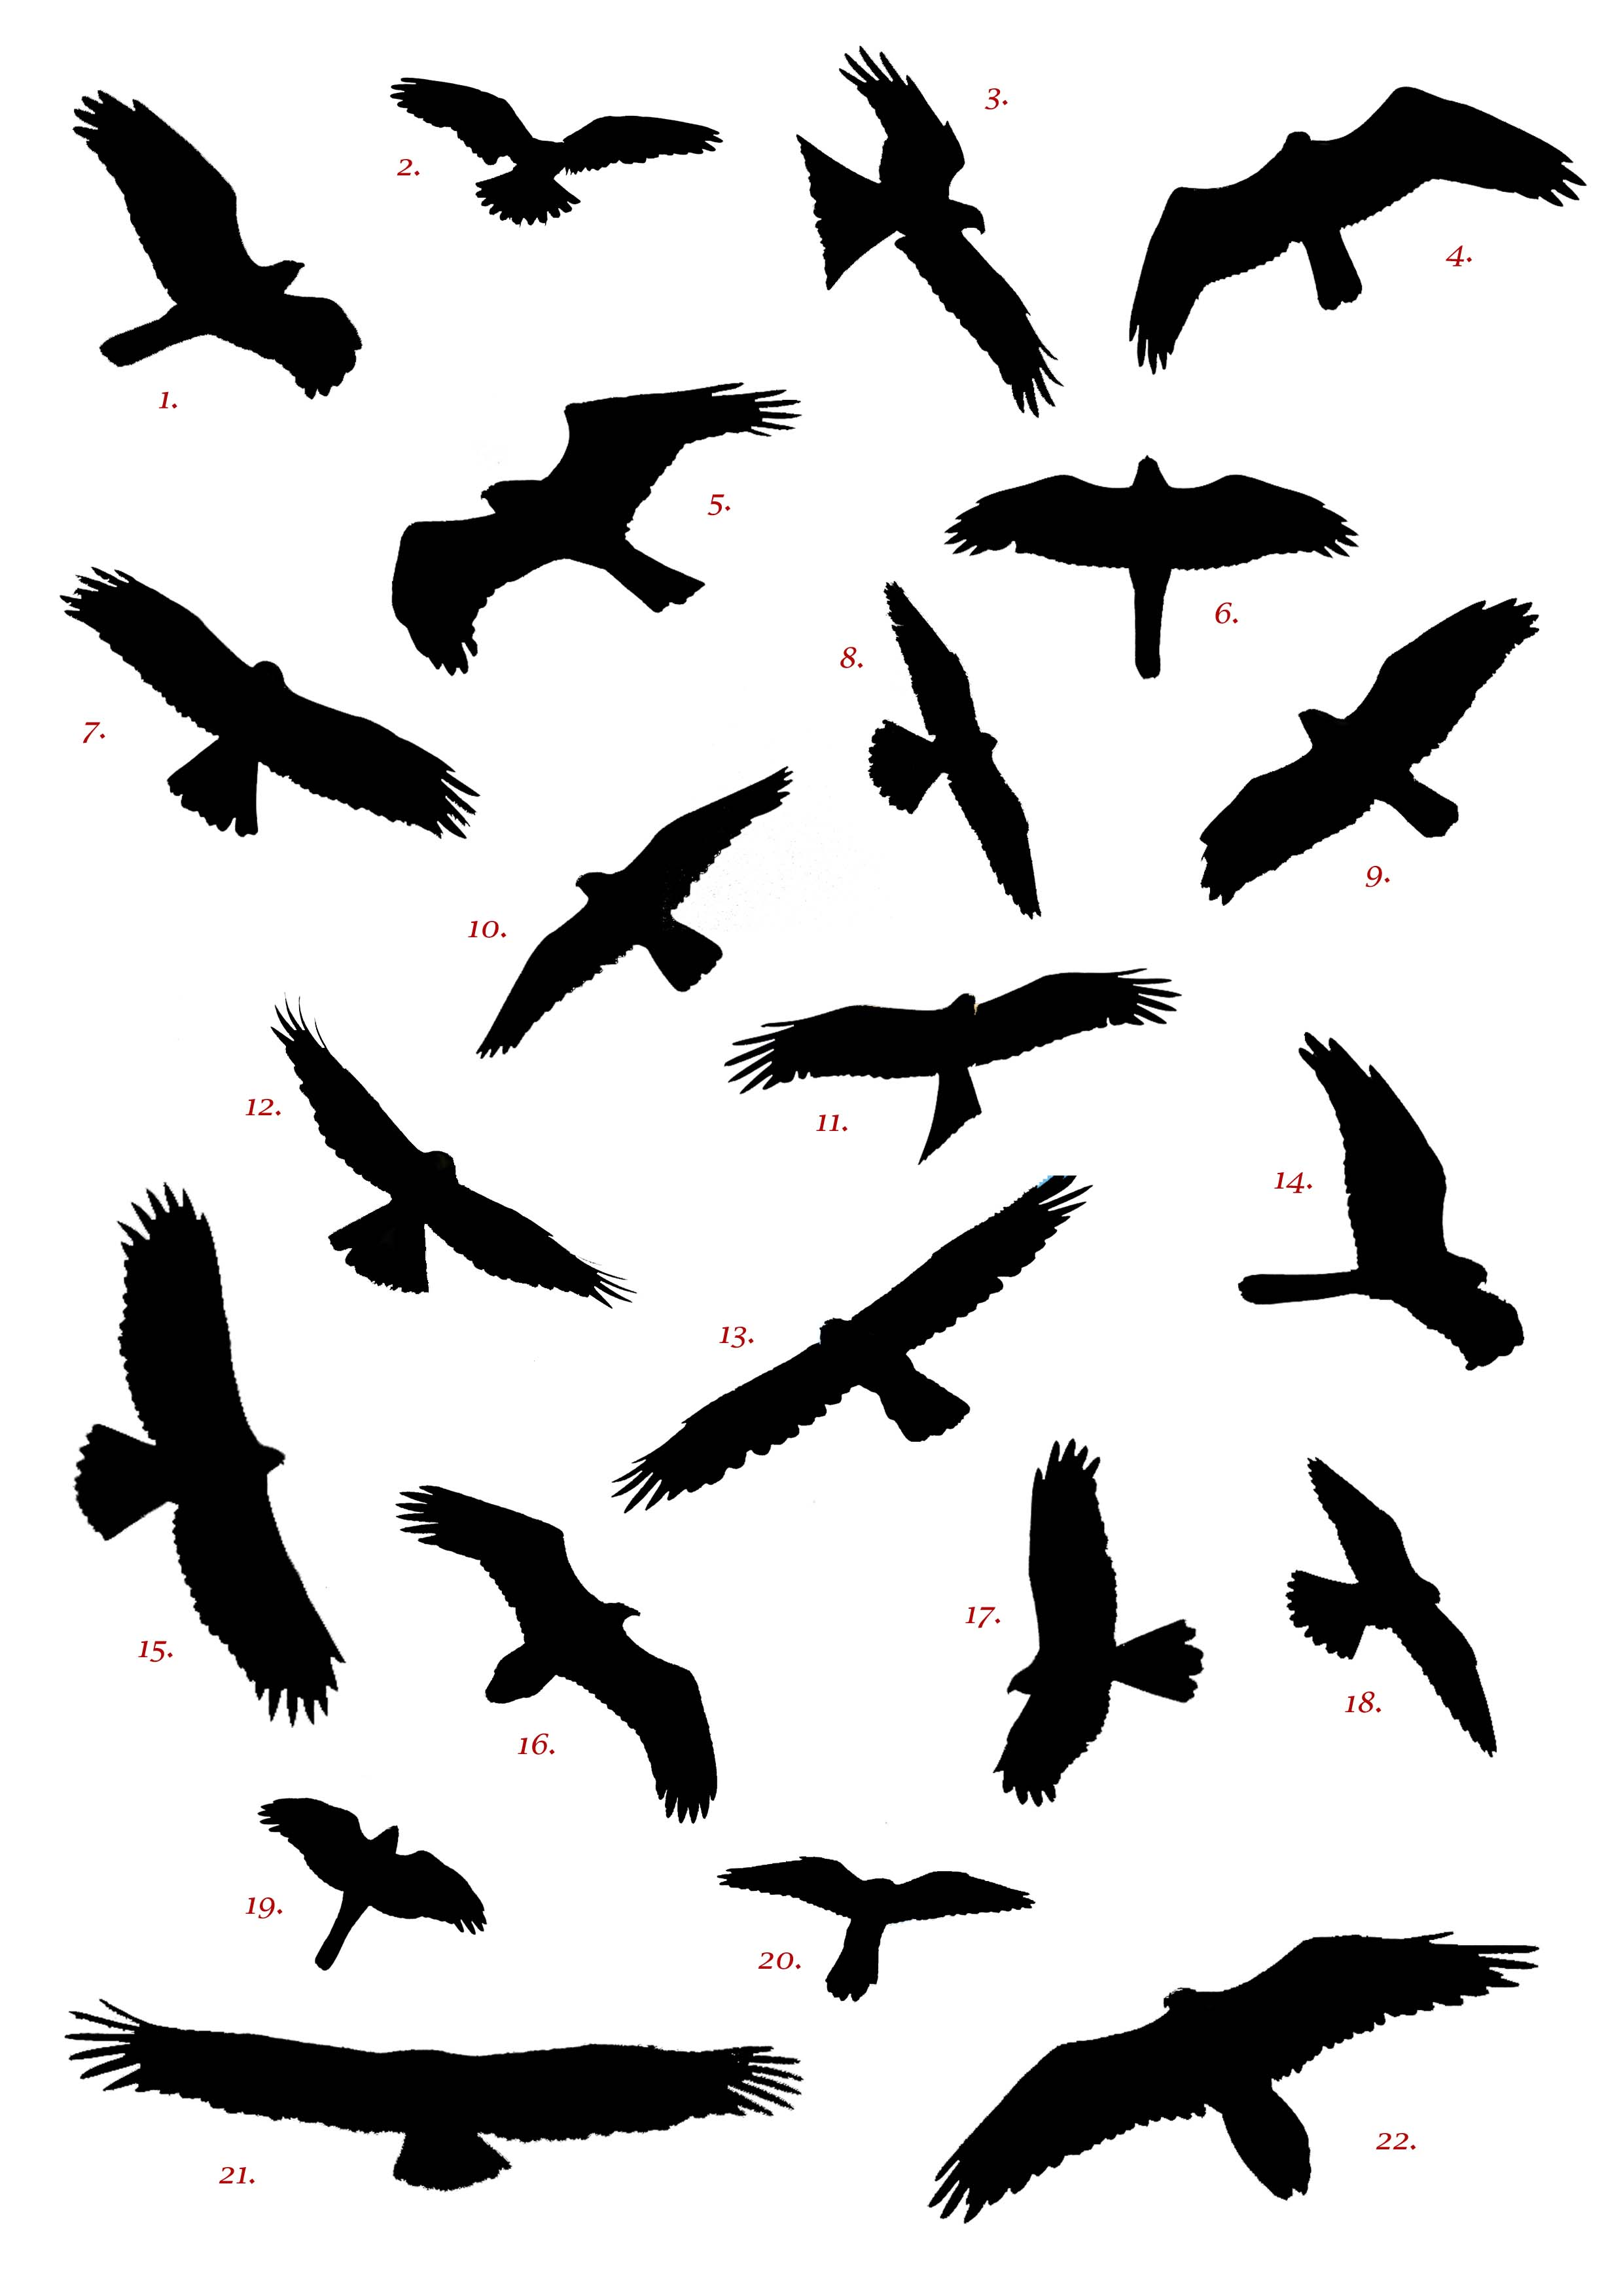 Spanish Raptor Silhouette Competition   Birding In Spain Blog.